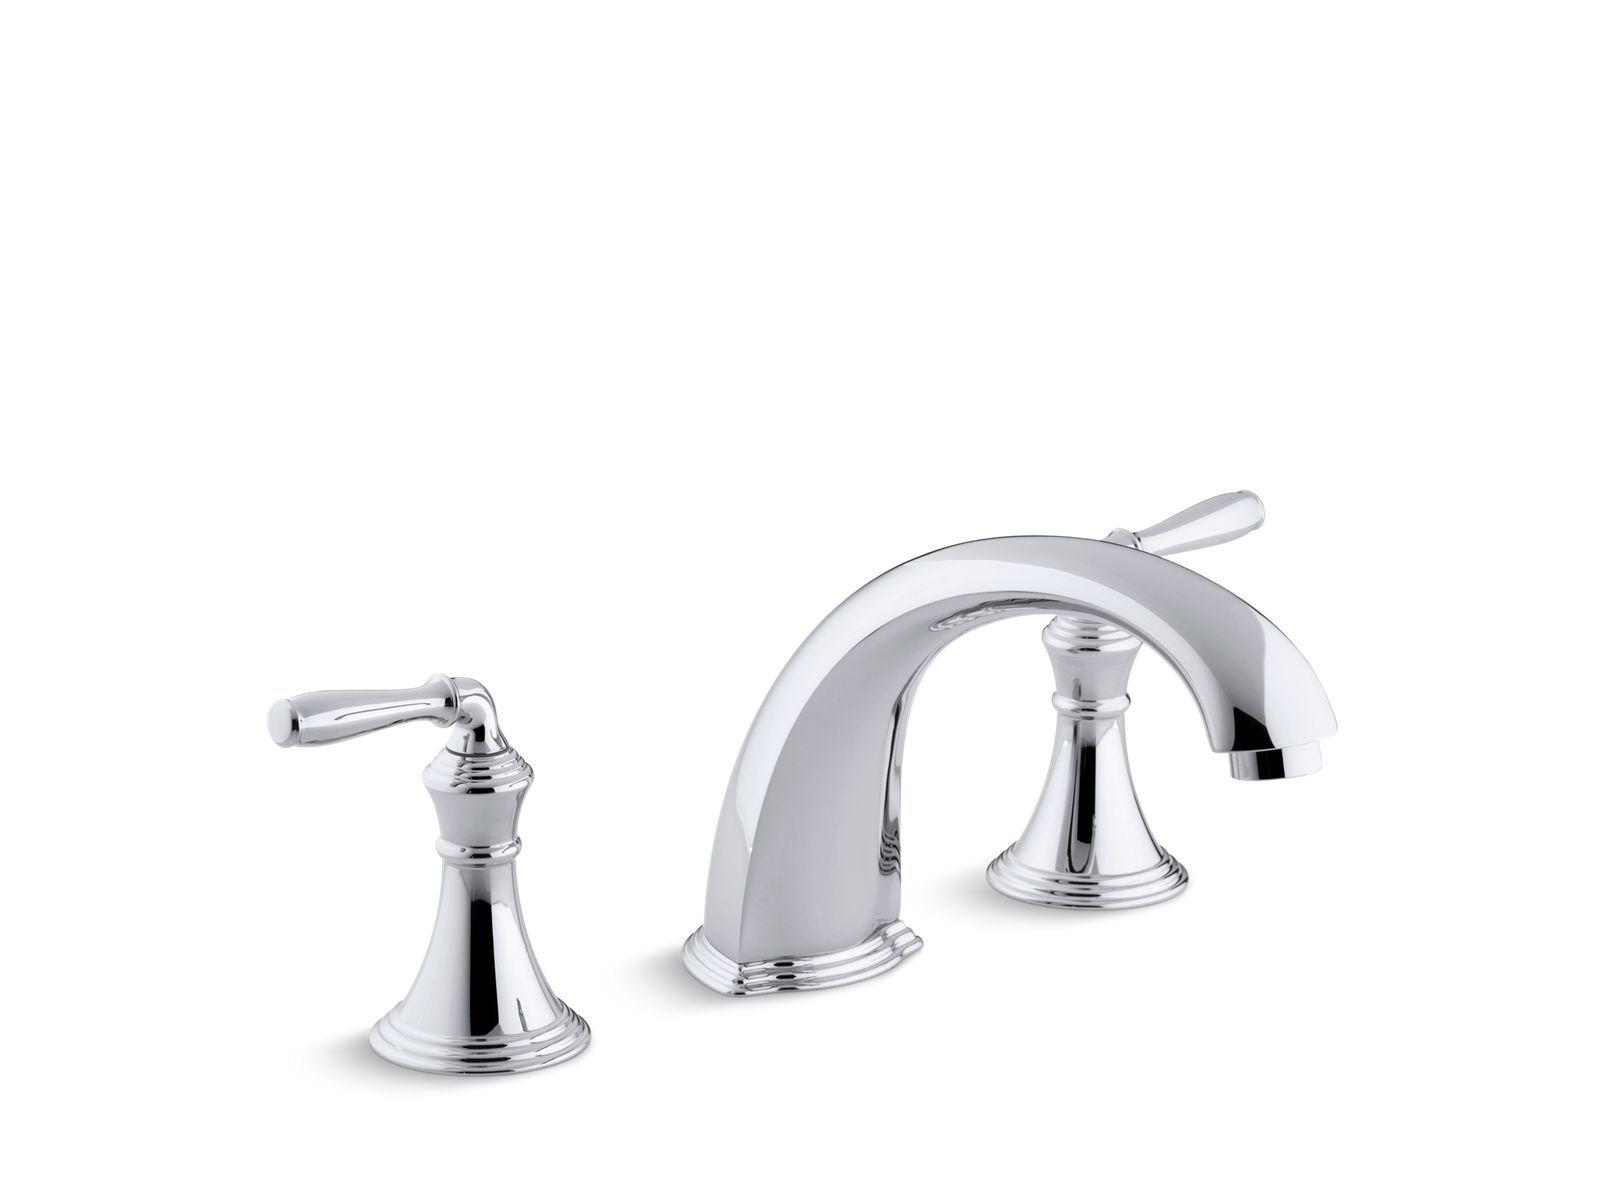 Kohler Devonshire Deck /Rim Mount Bath Faucet Trim For High Flow Valve With  Non Diverter Spout And Lever Handles, Valve Not Included Finish: Pol.